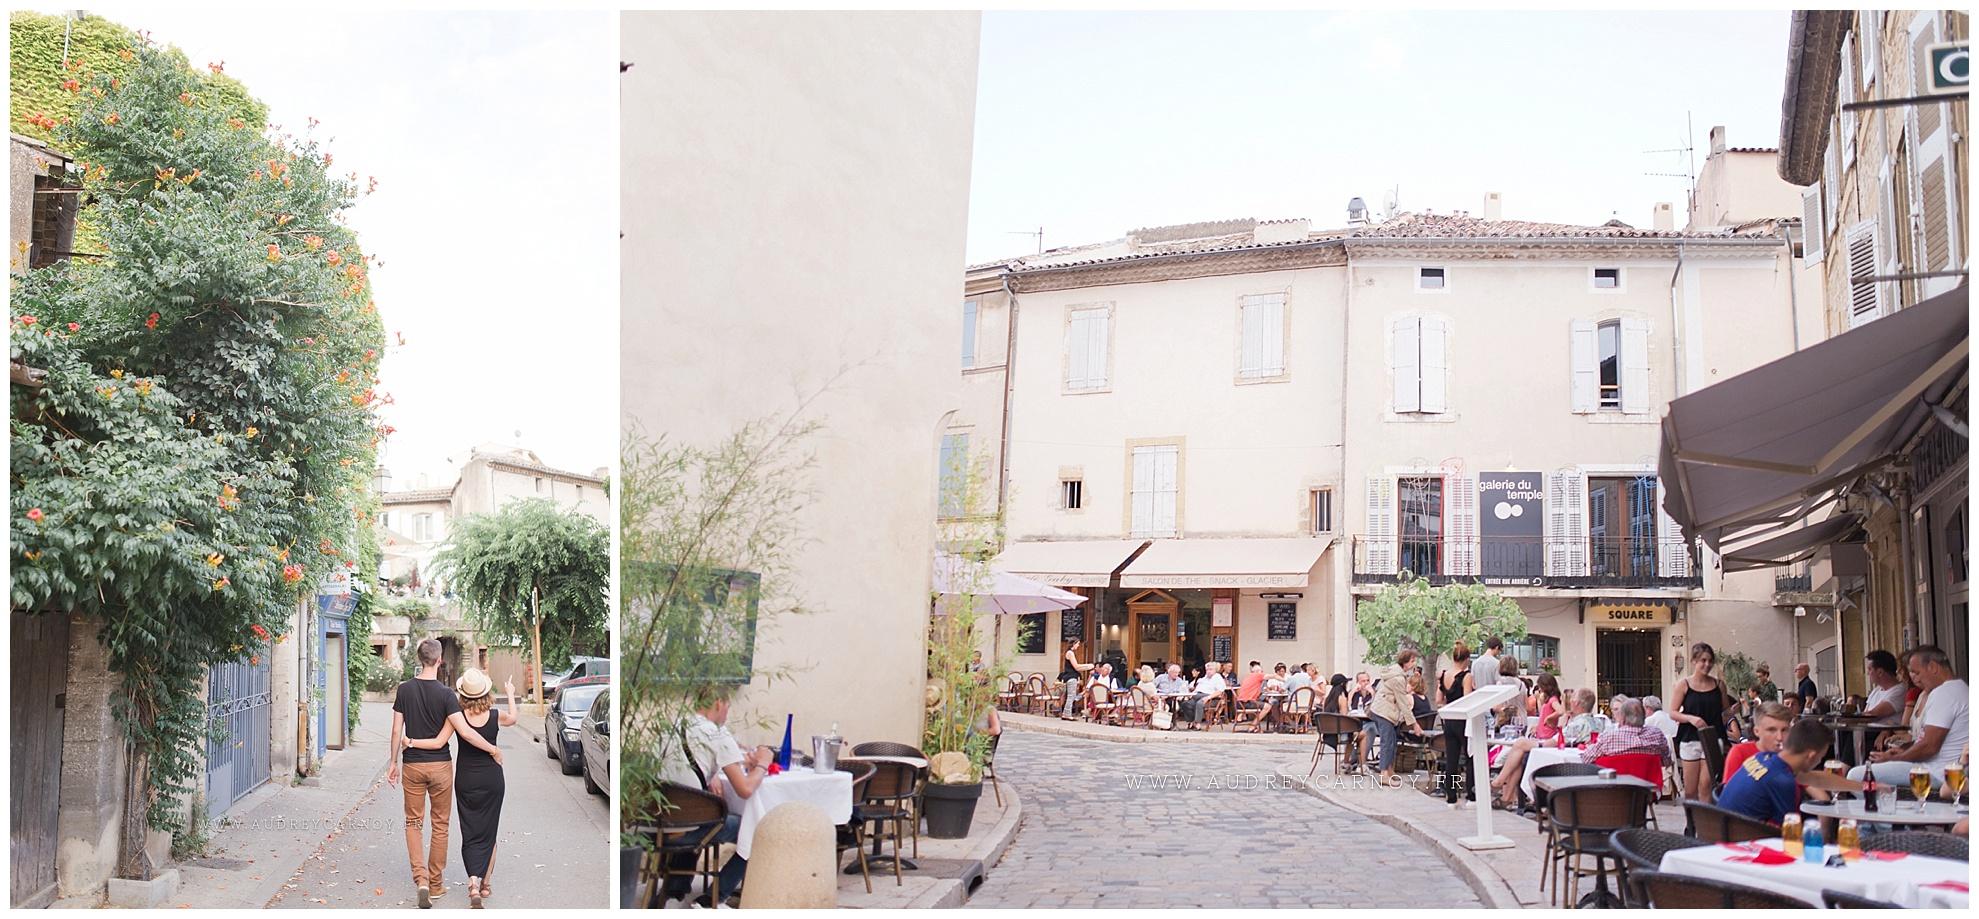 Seance grossesse Provence - Pertuis | Audrey & Jerome 9